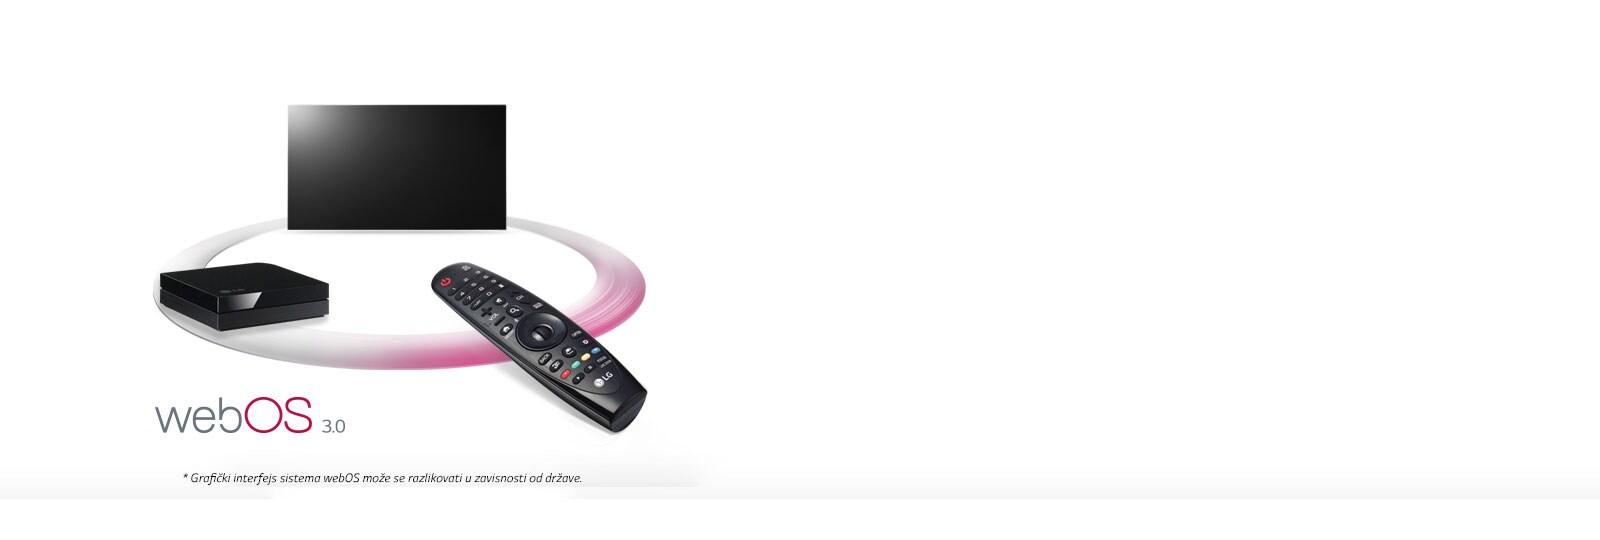 Magical remote